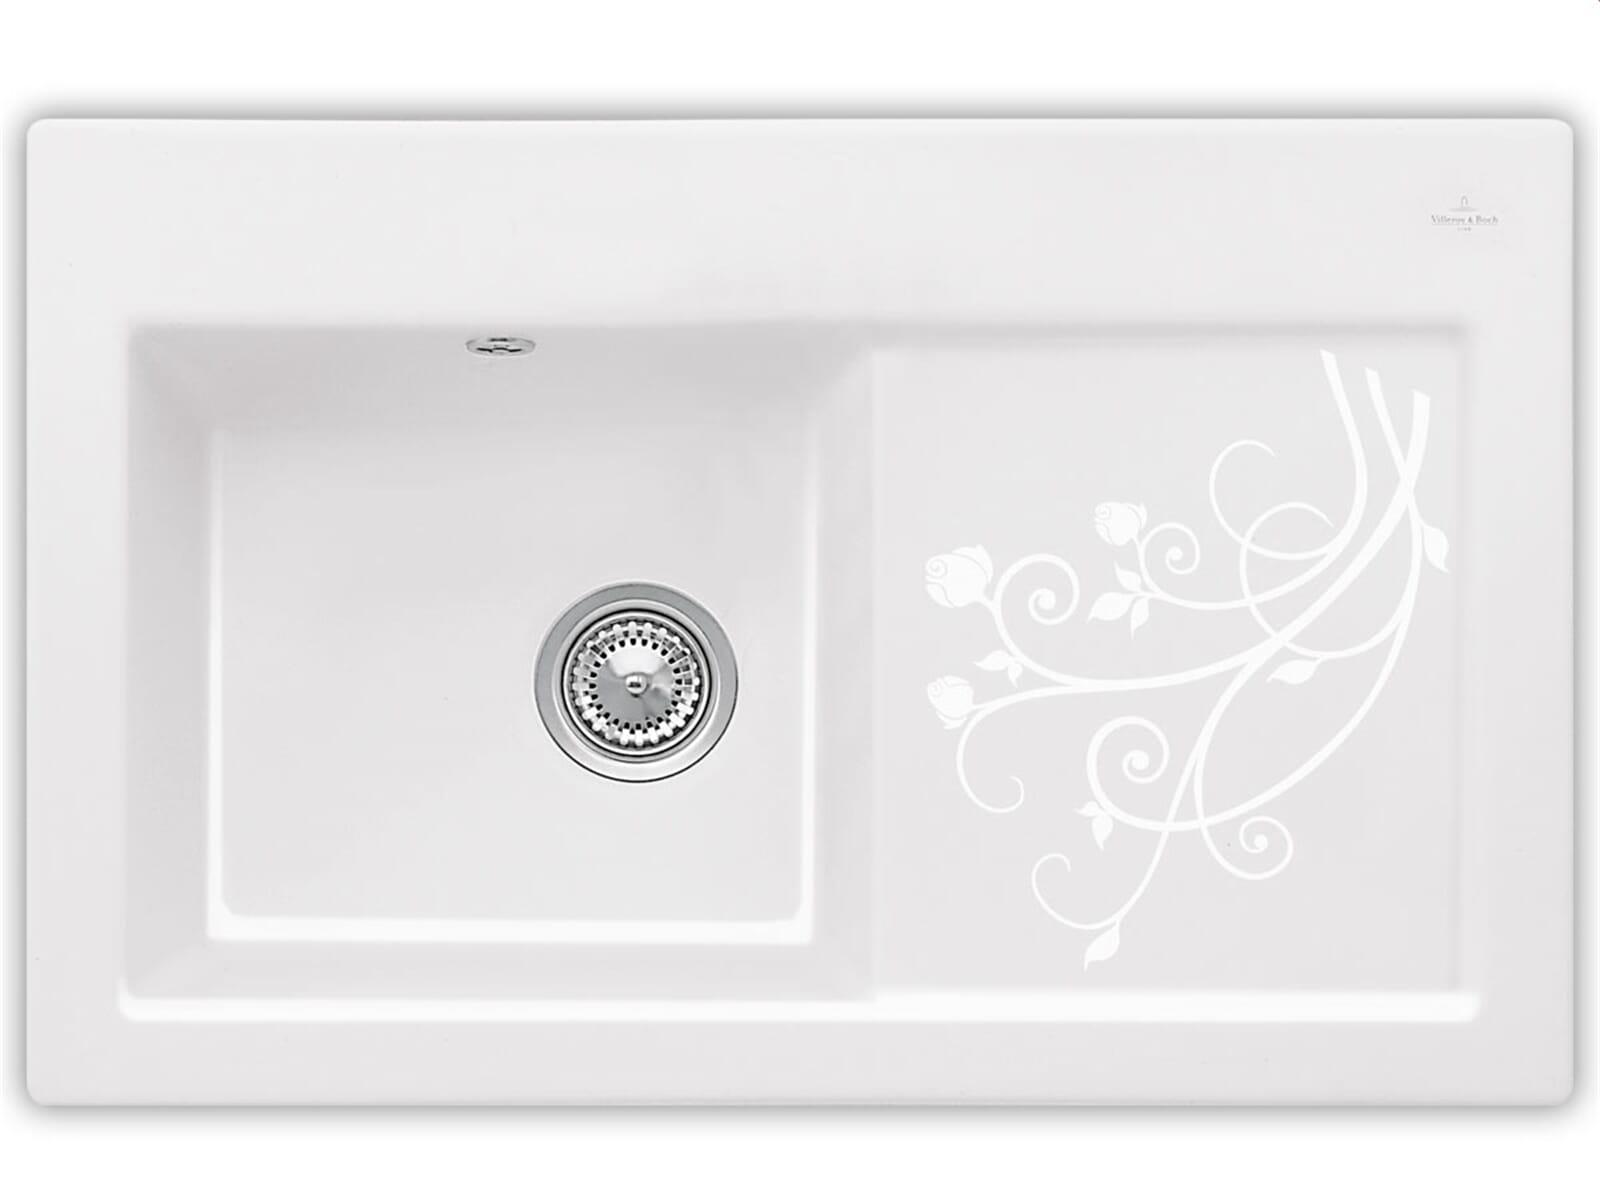 villeroy boch subway 45 la rose 6772 01 kw keramiksp le handbet tigung. Black Bedroom Furniture Sets. Home Design Ideas